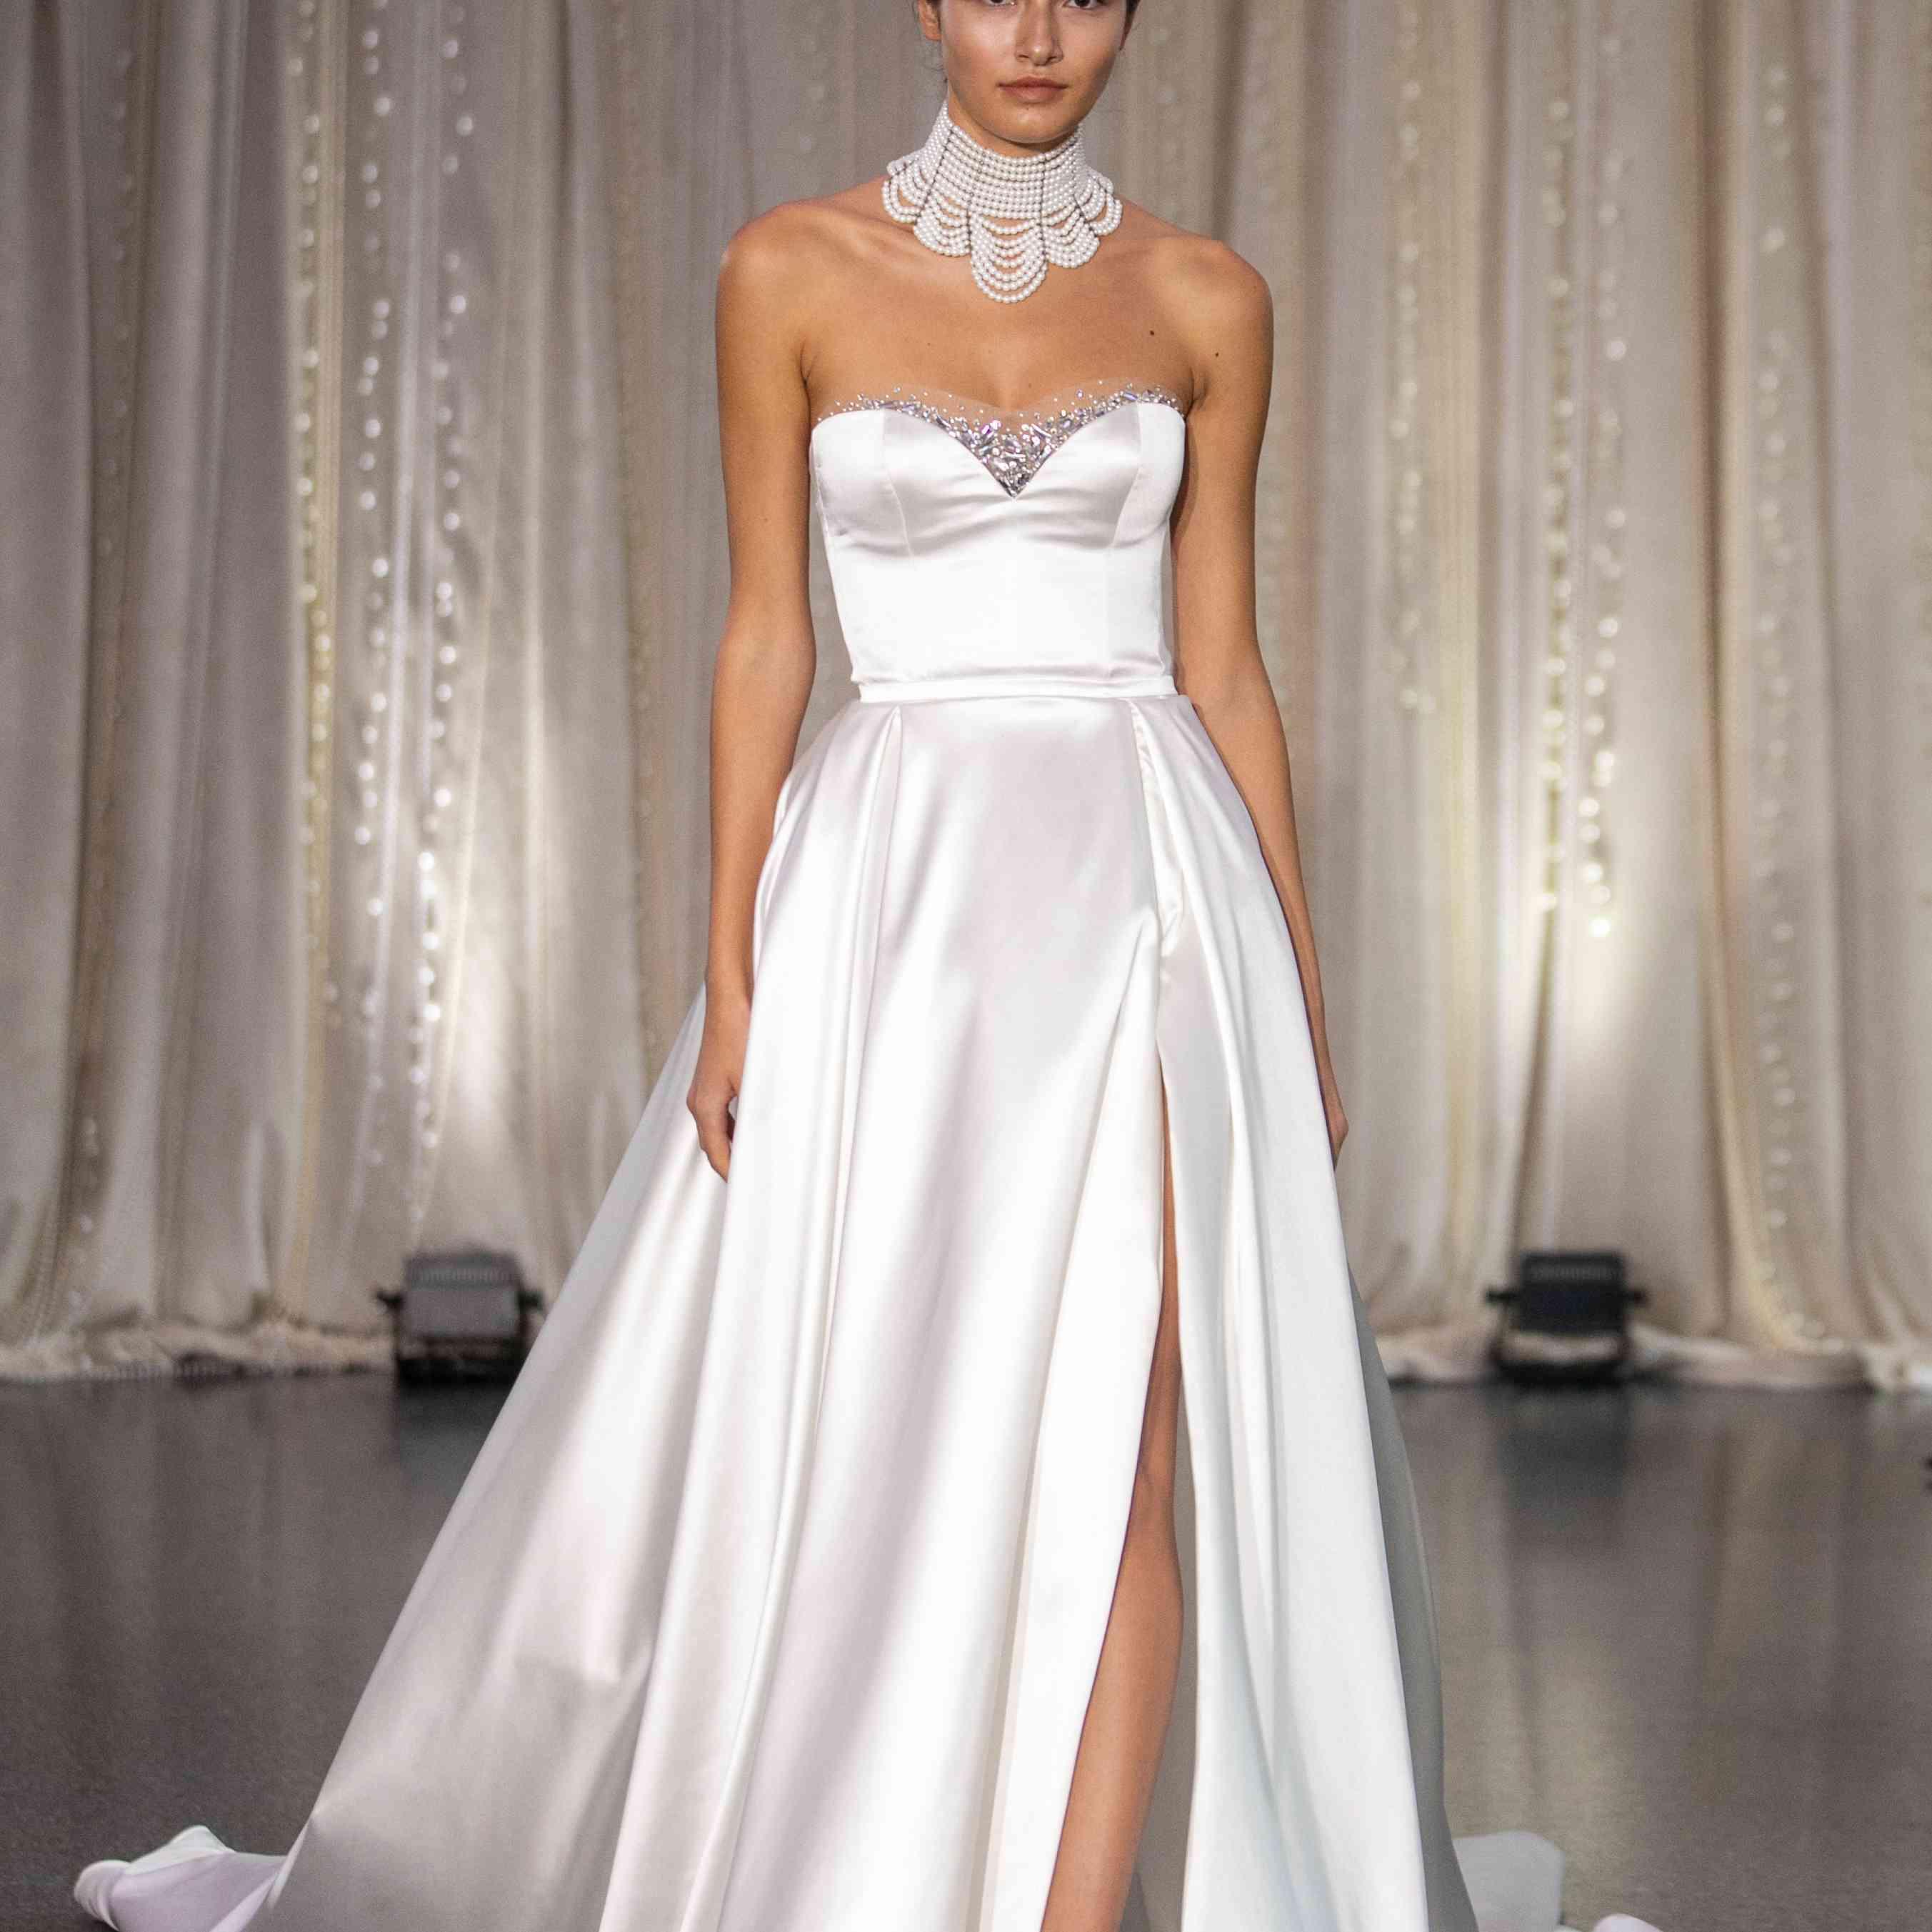 Model in strapless sweetheart wedding dress